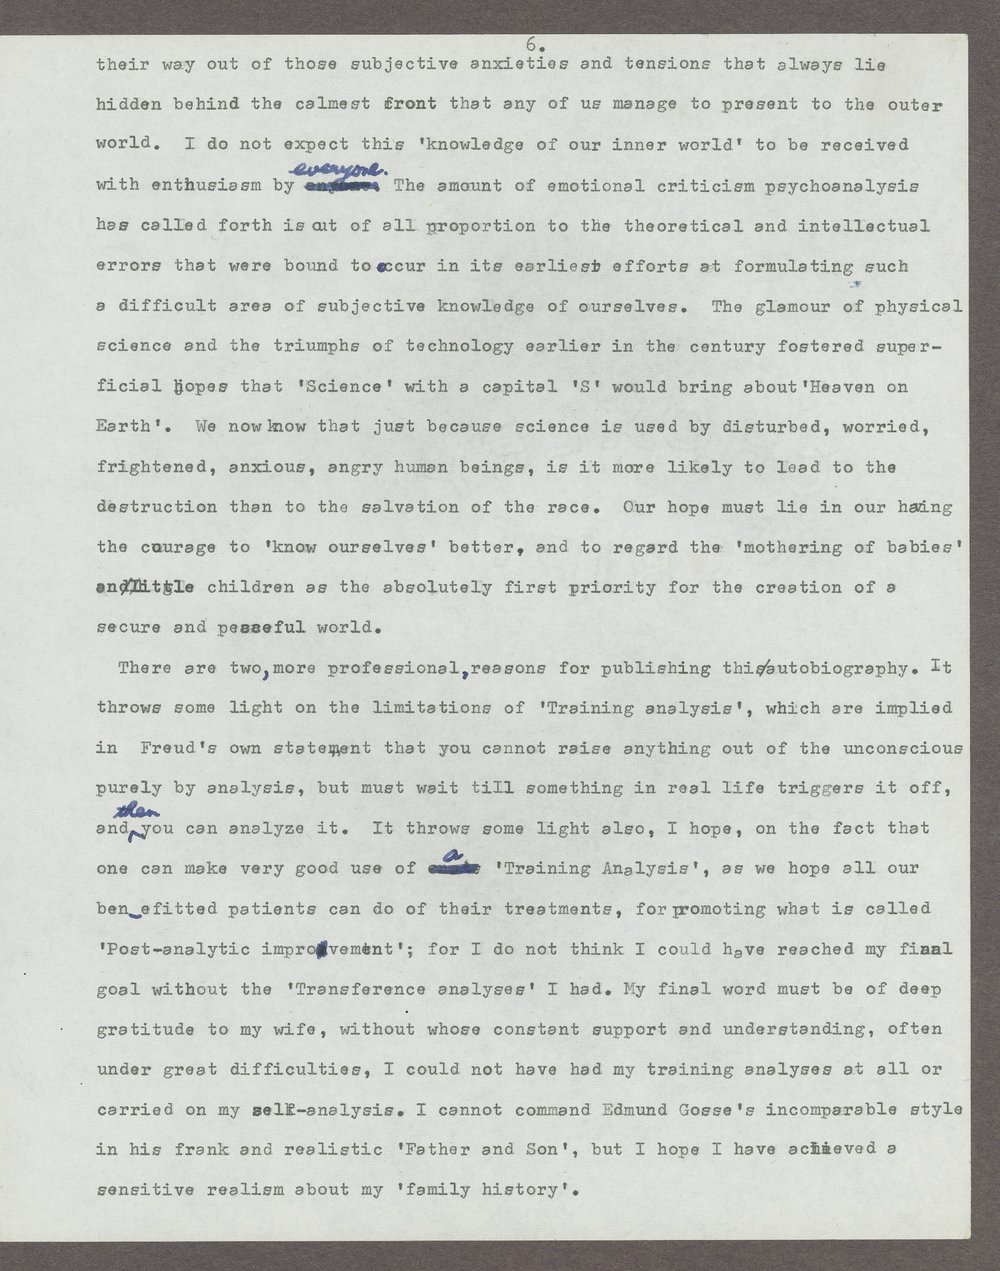 Harry Guntrip manuscripts - 9